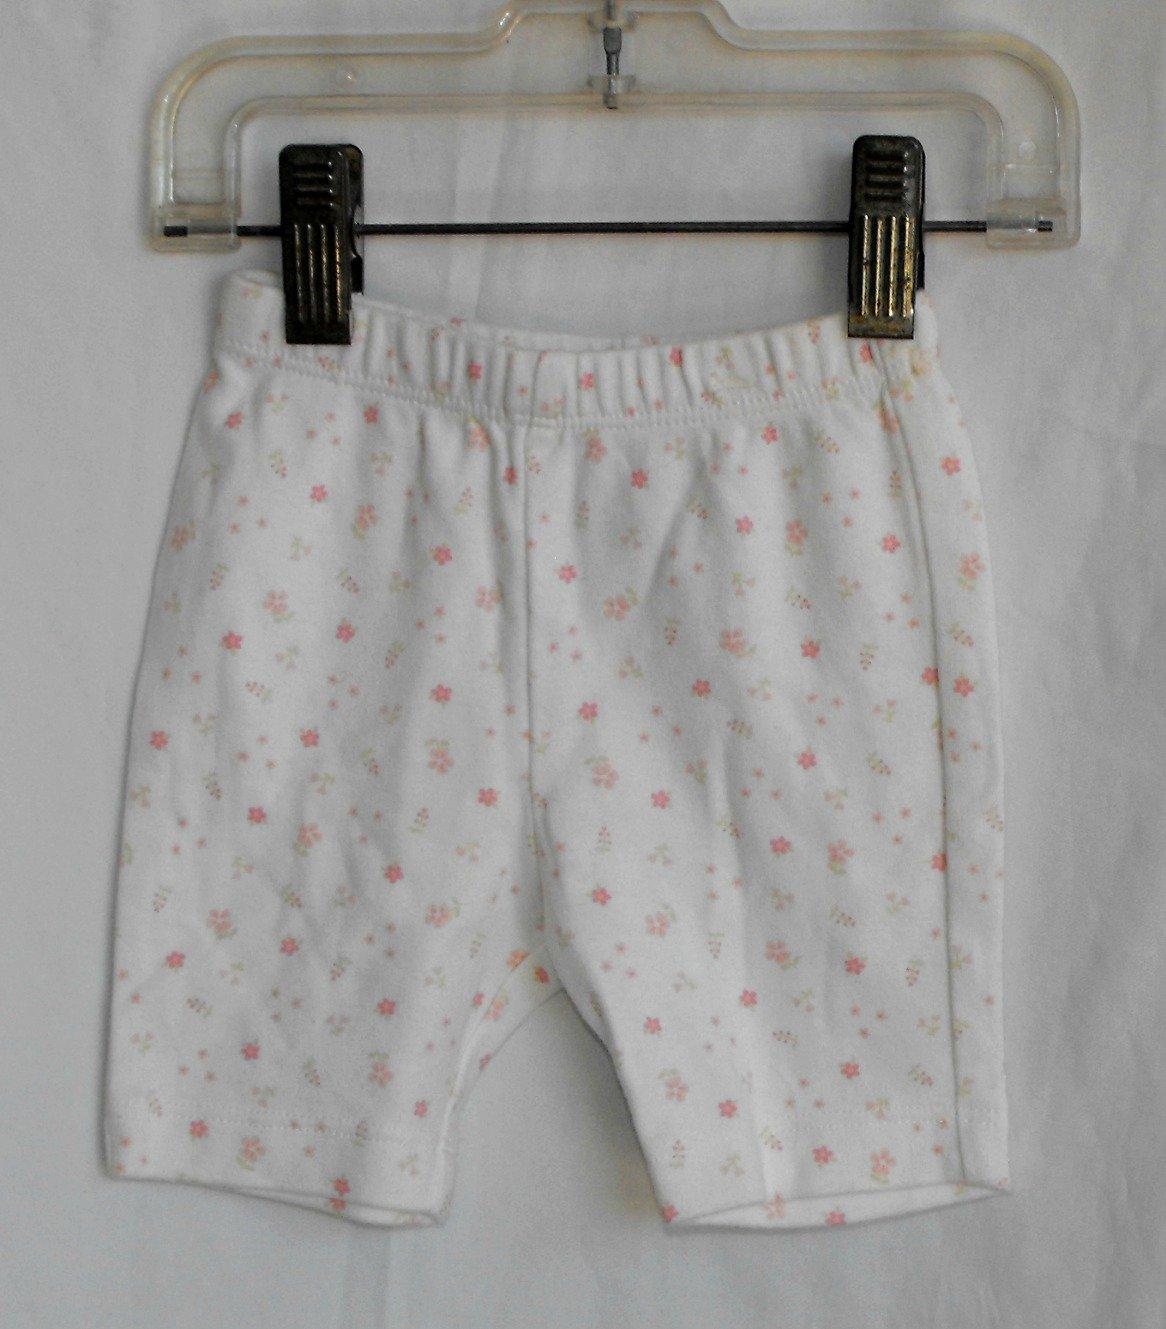 Carter's Just One Year Baby Girl Preemie pants